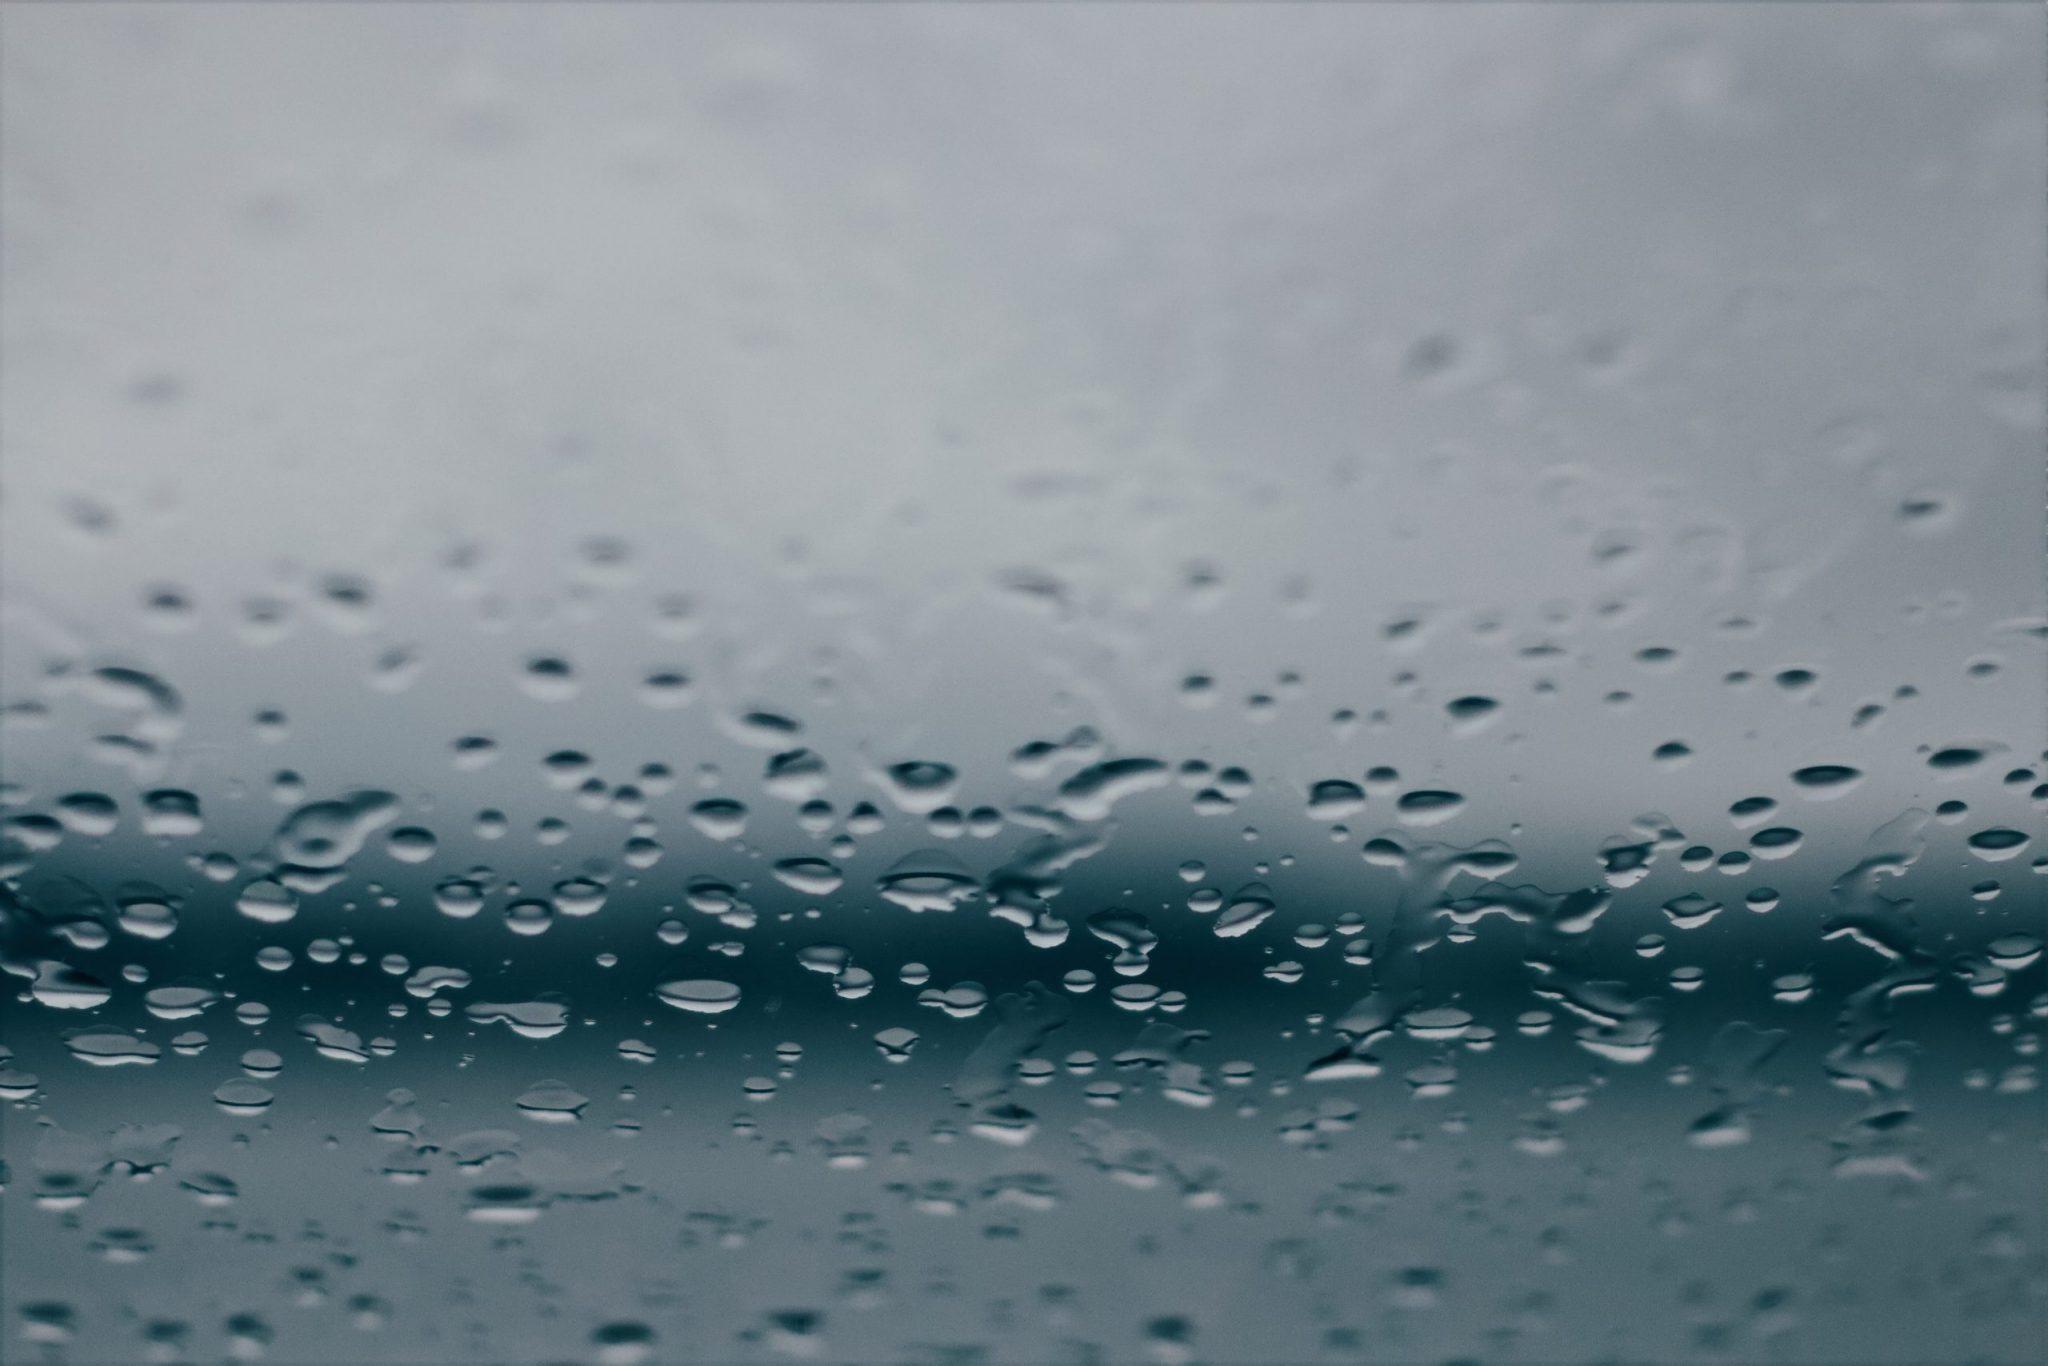 raindrop brushes